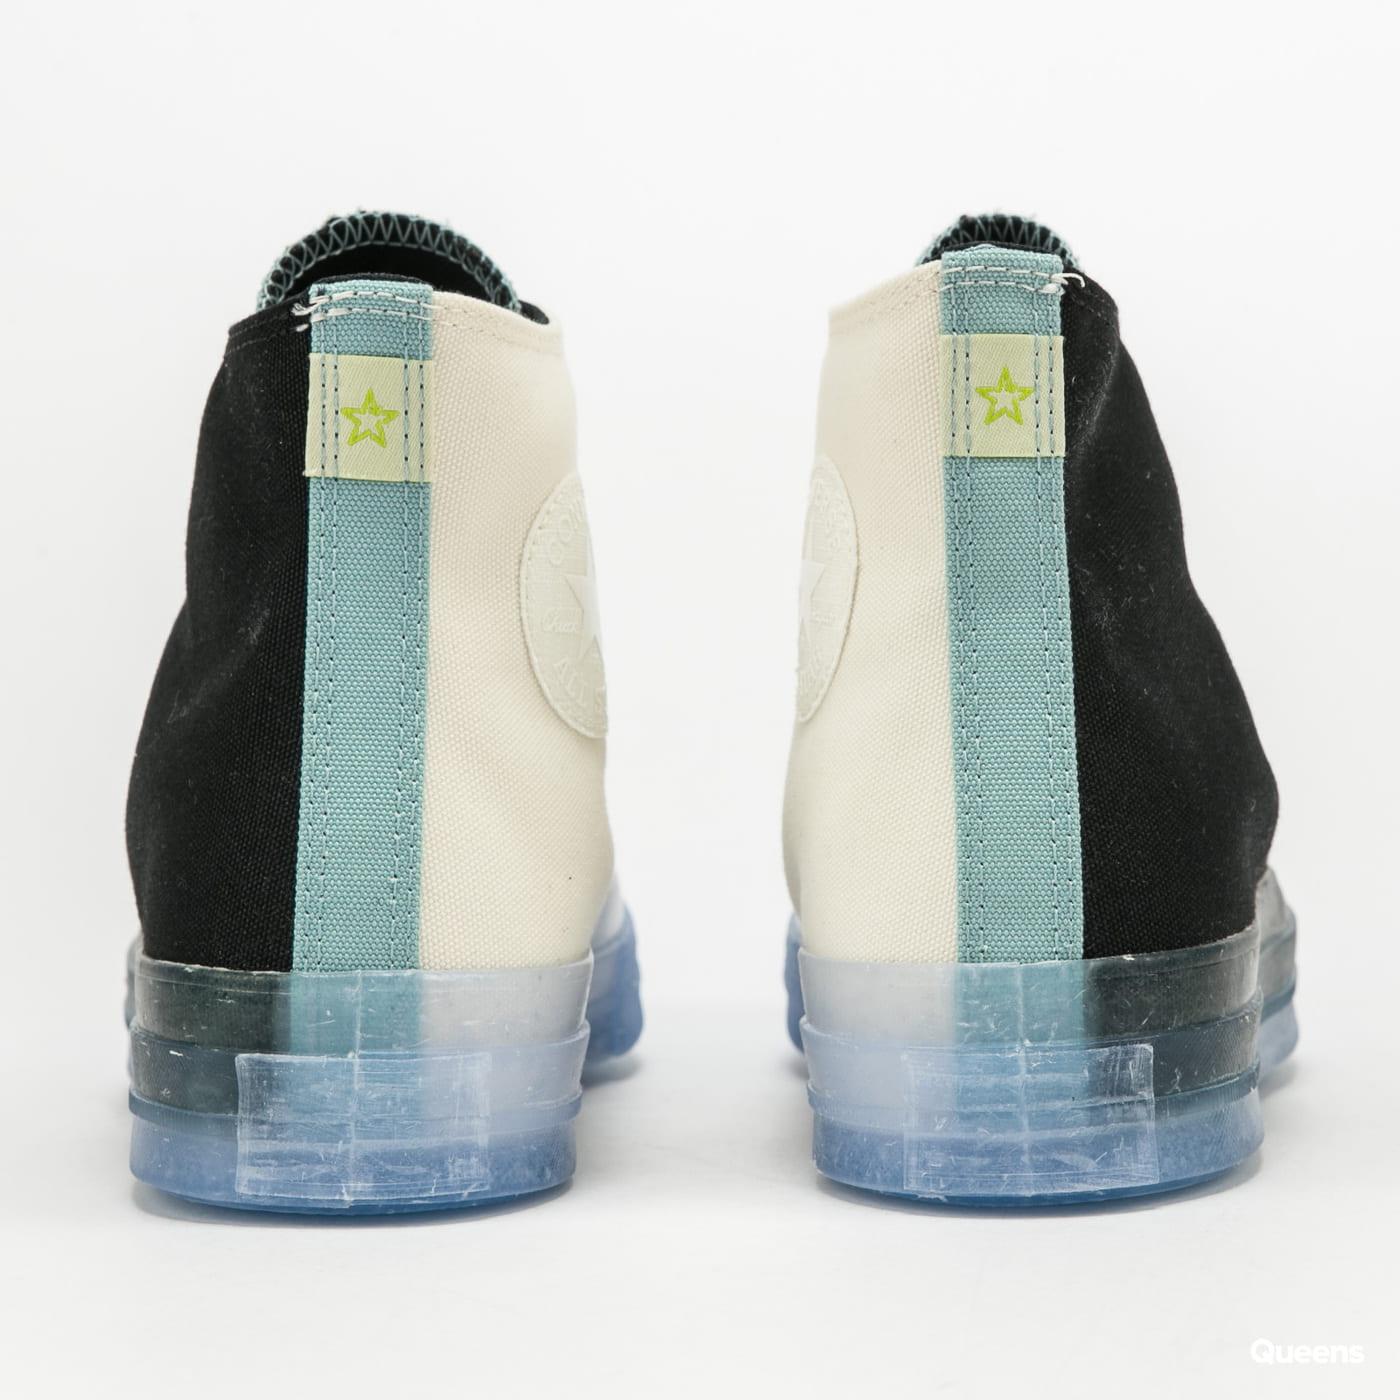 Converse Chuck 70 Hi egret / black / forest pine